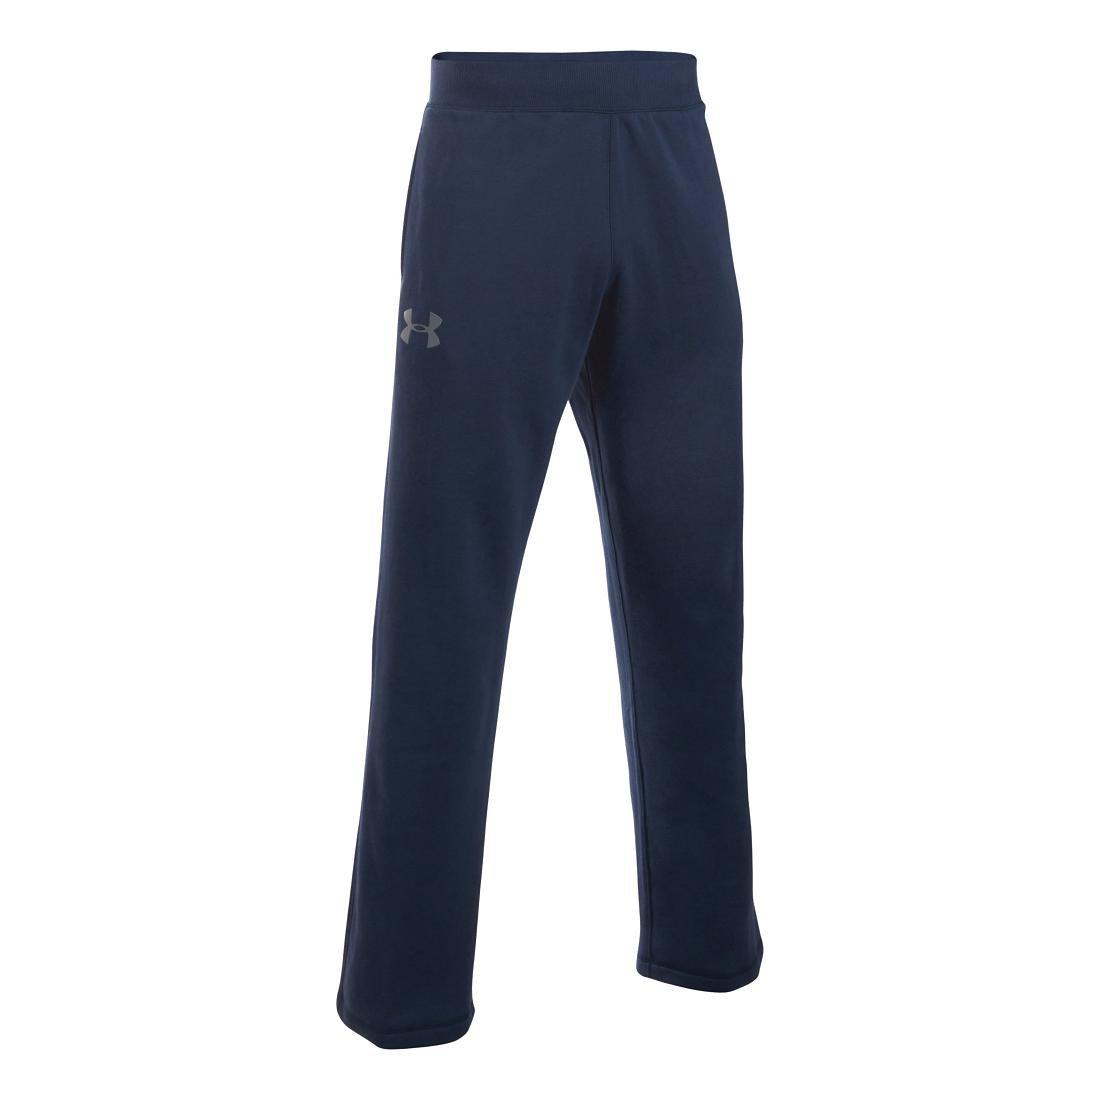 Under Armour Men's Rival Fleece Pants Under Armour Apparel 1248351